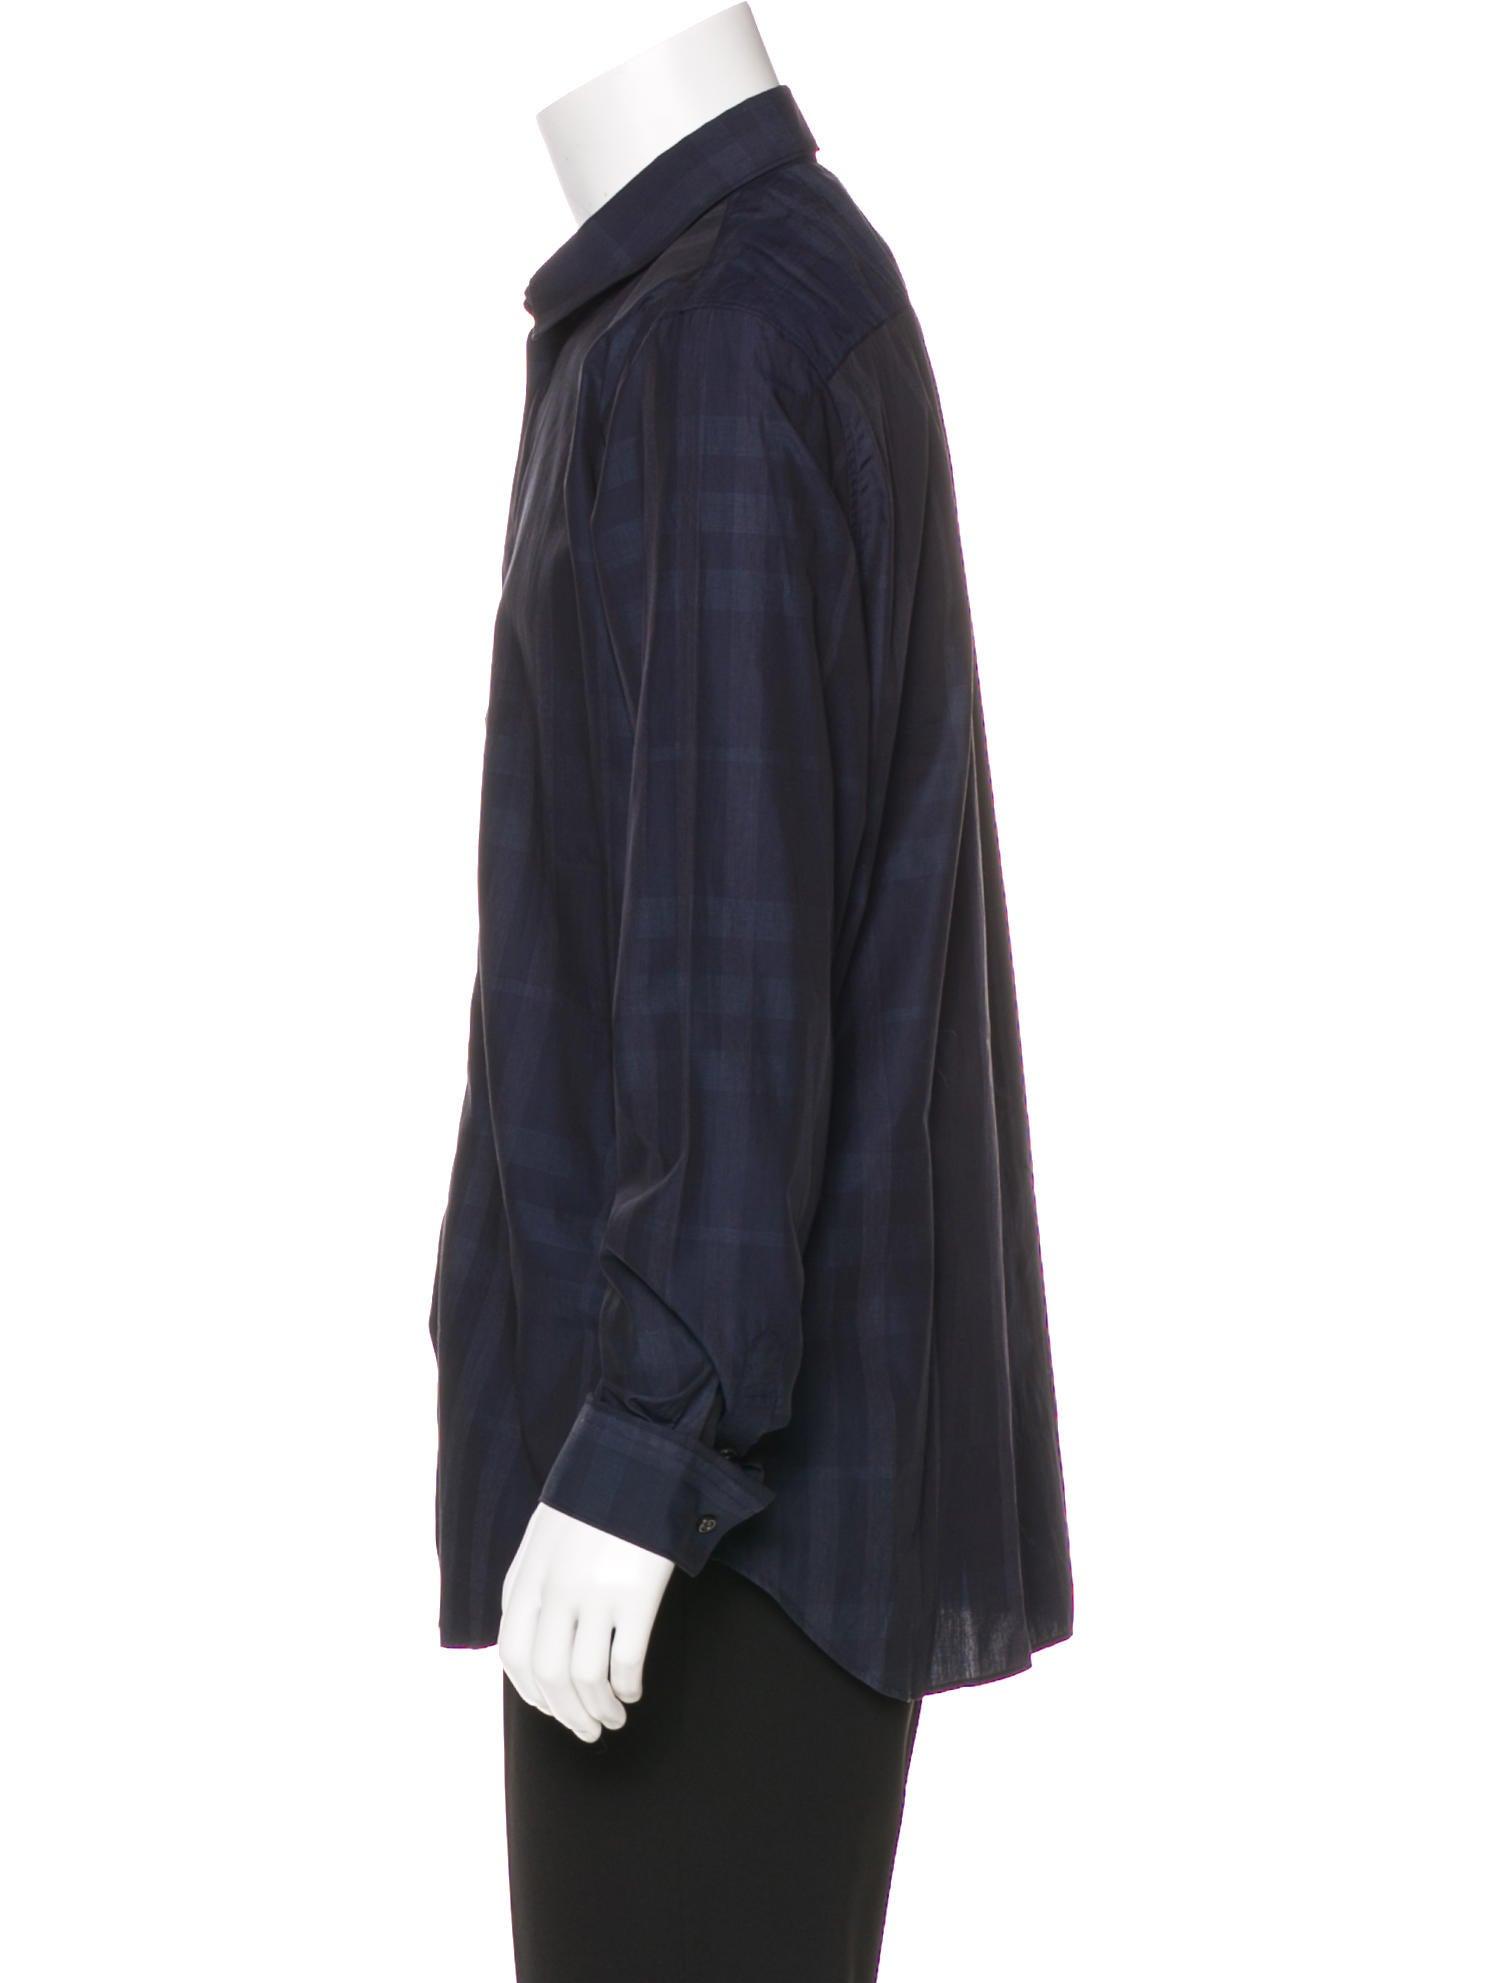 Burberry london check woven shirt w tags clothing Woven t shirt tags